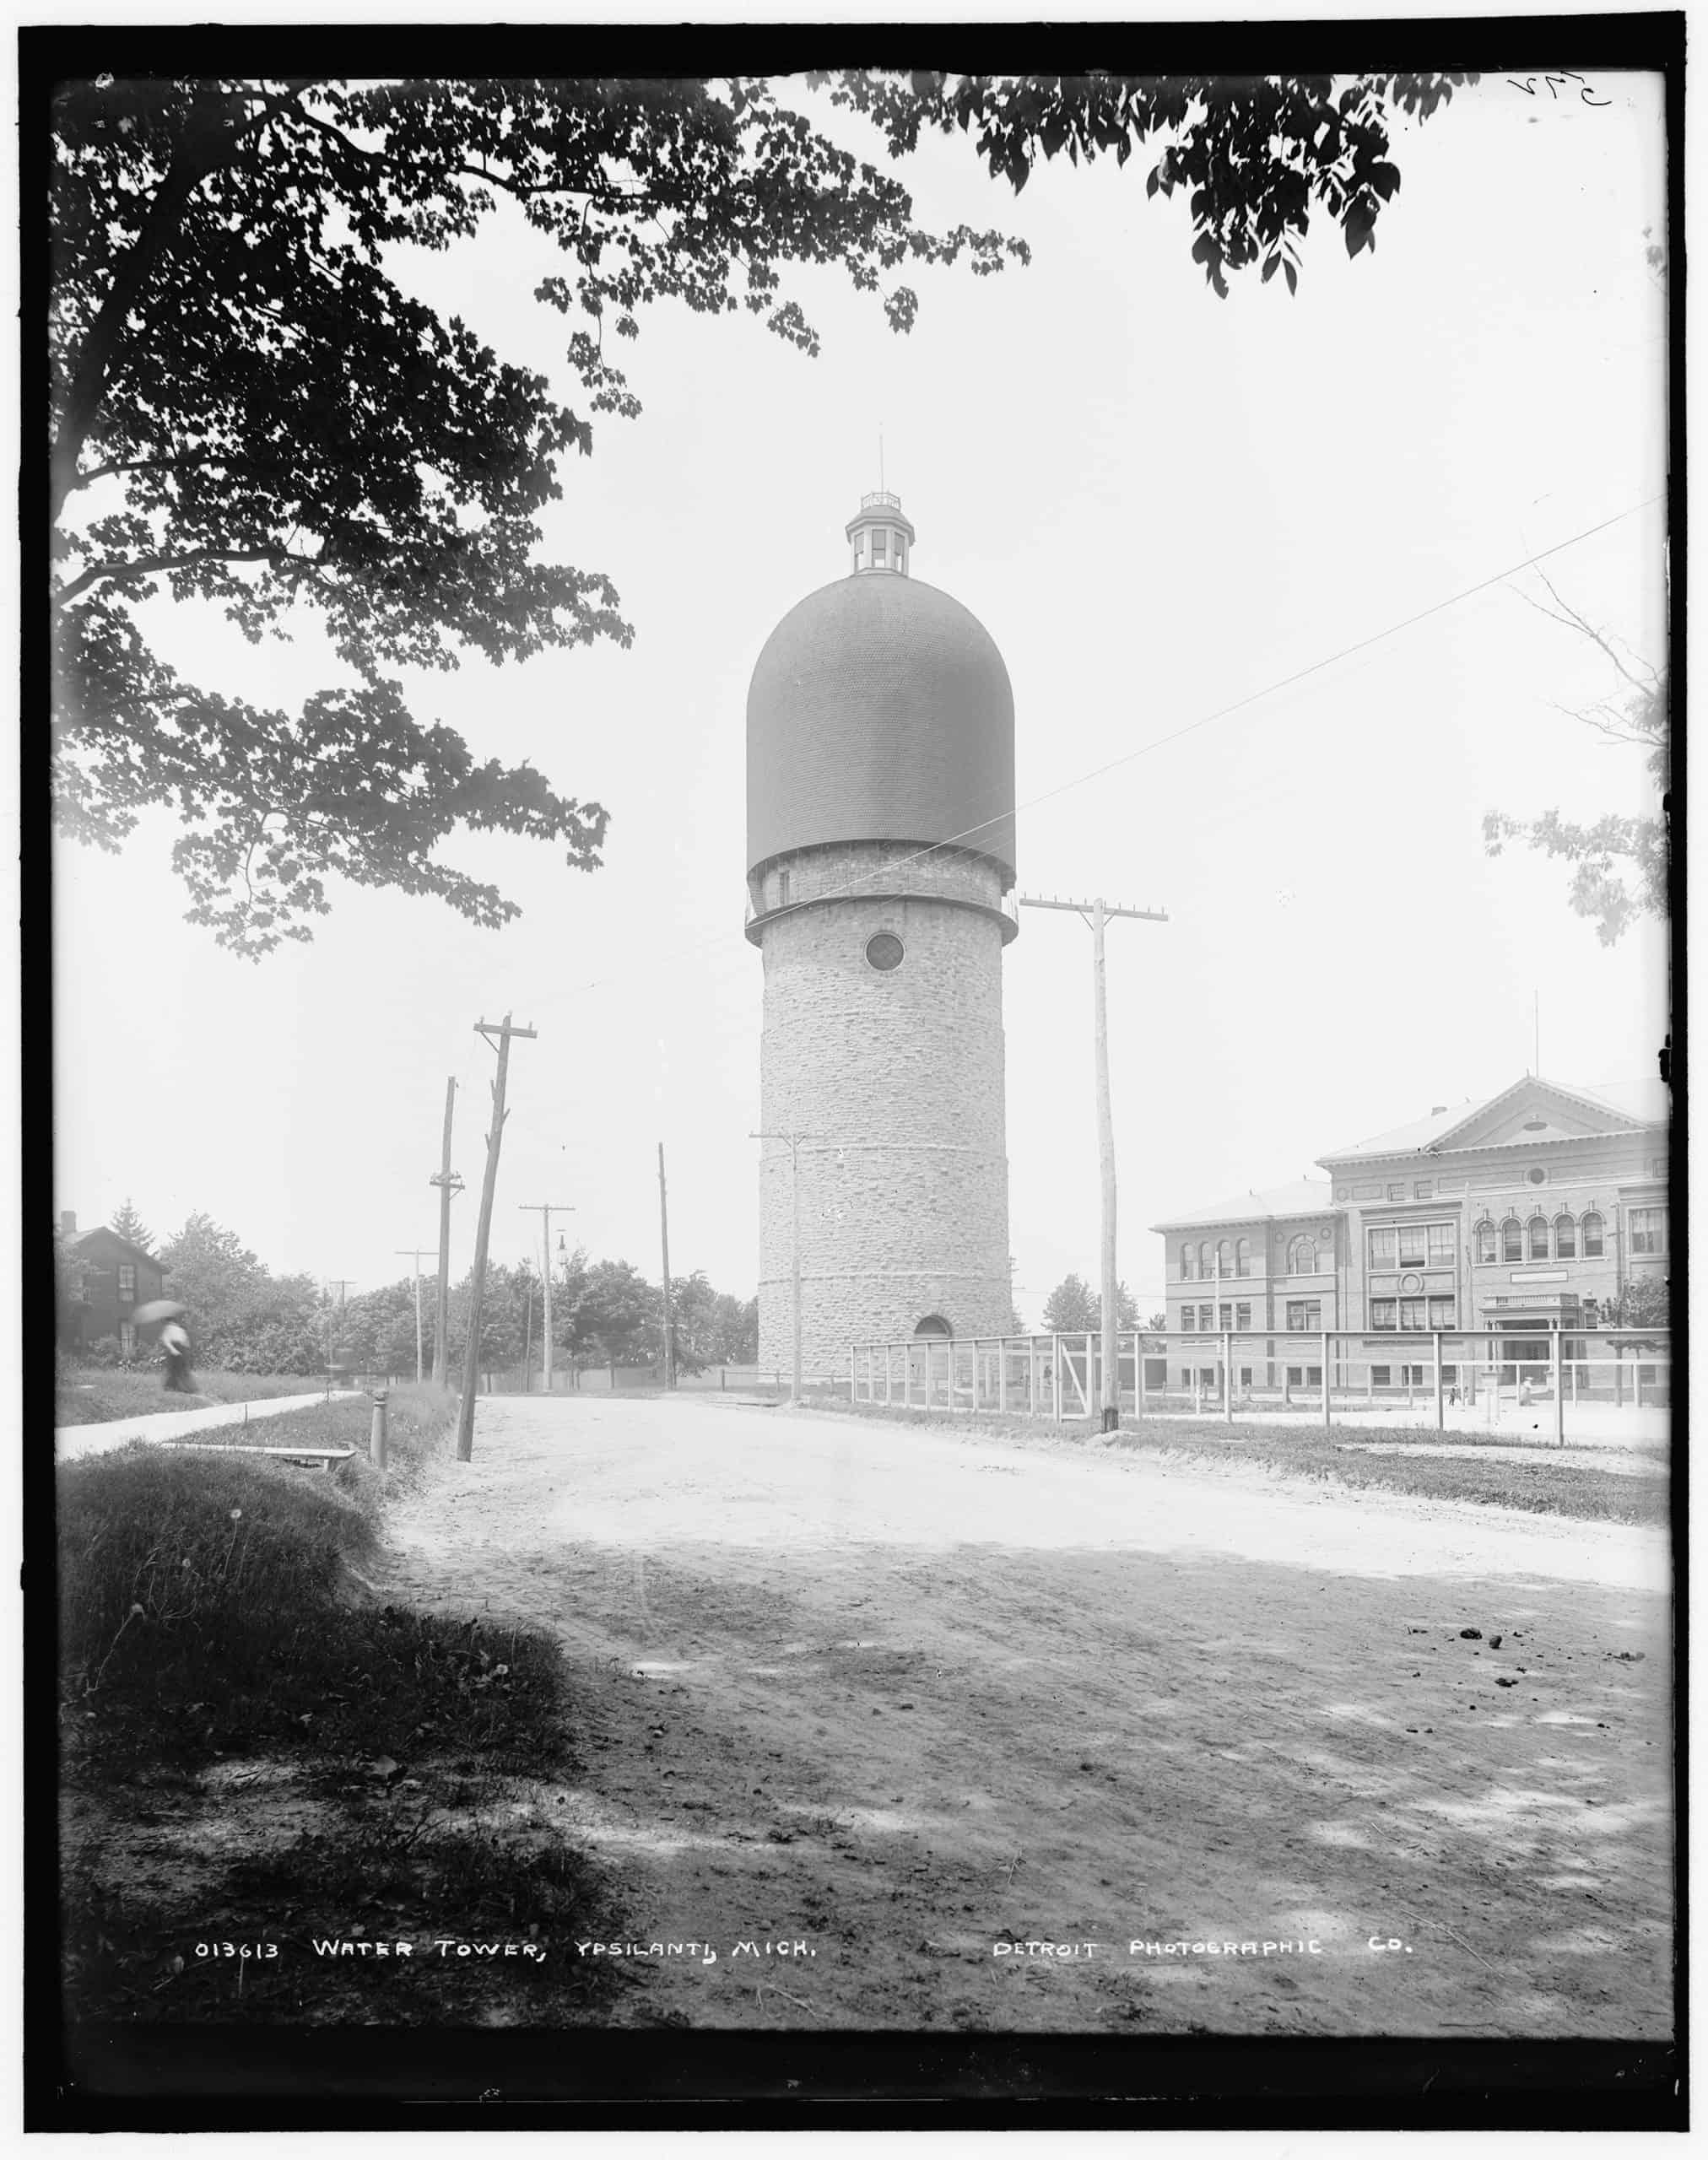 Water tower, Ypsilanti, Mich., Detroit Publishing Co., ca. 1900